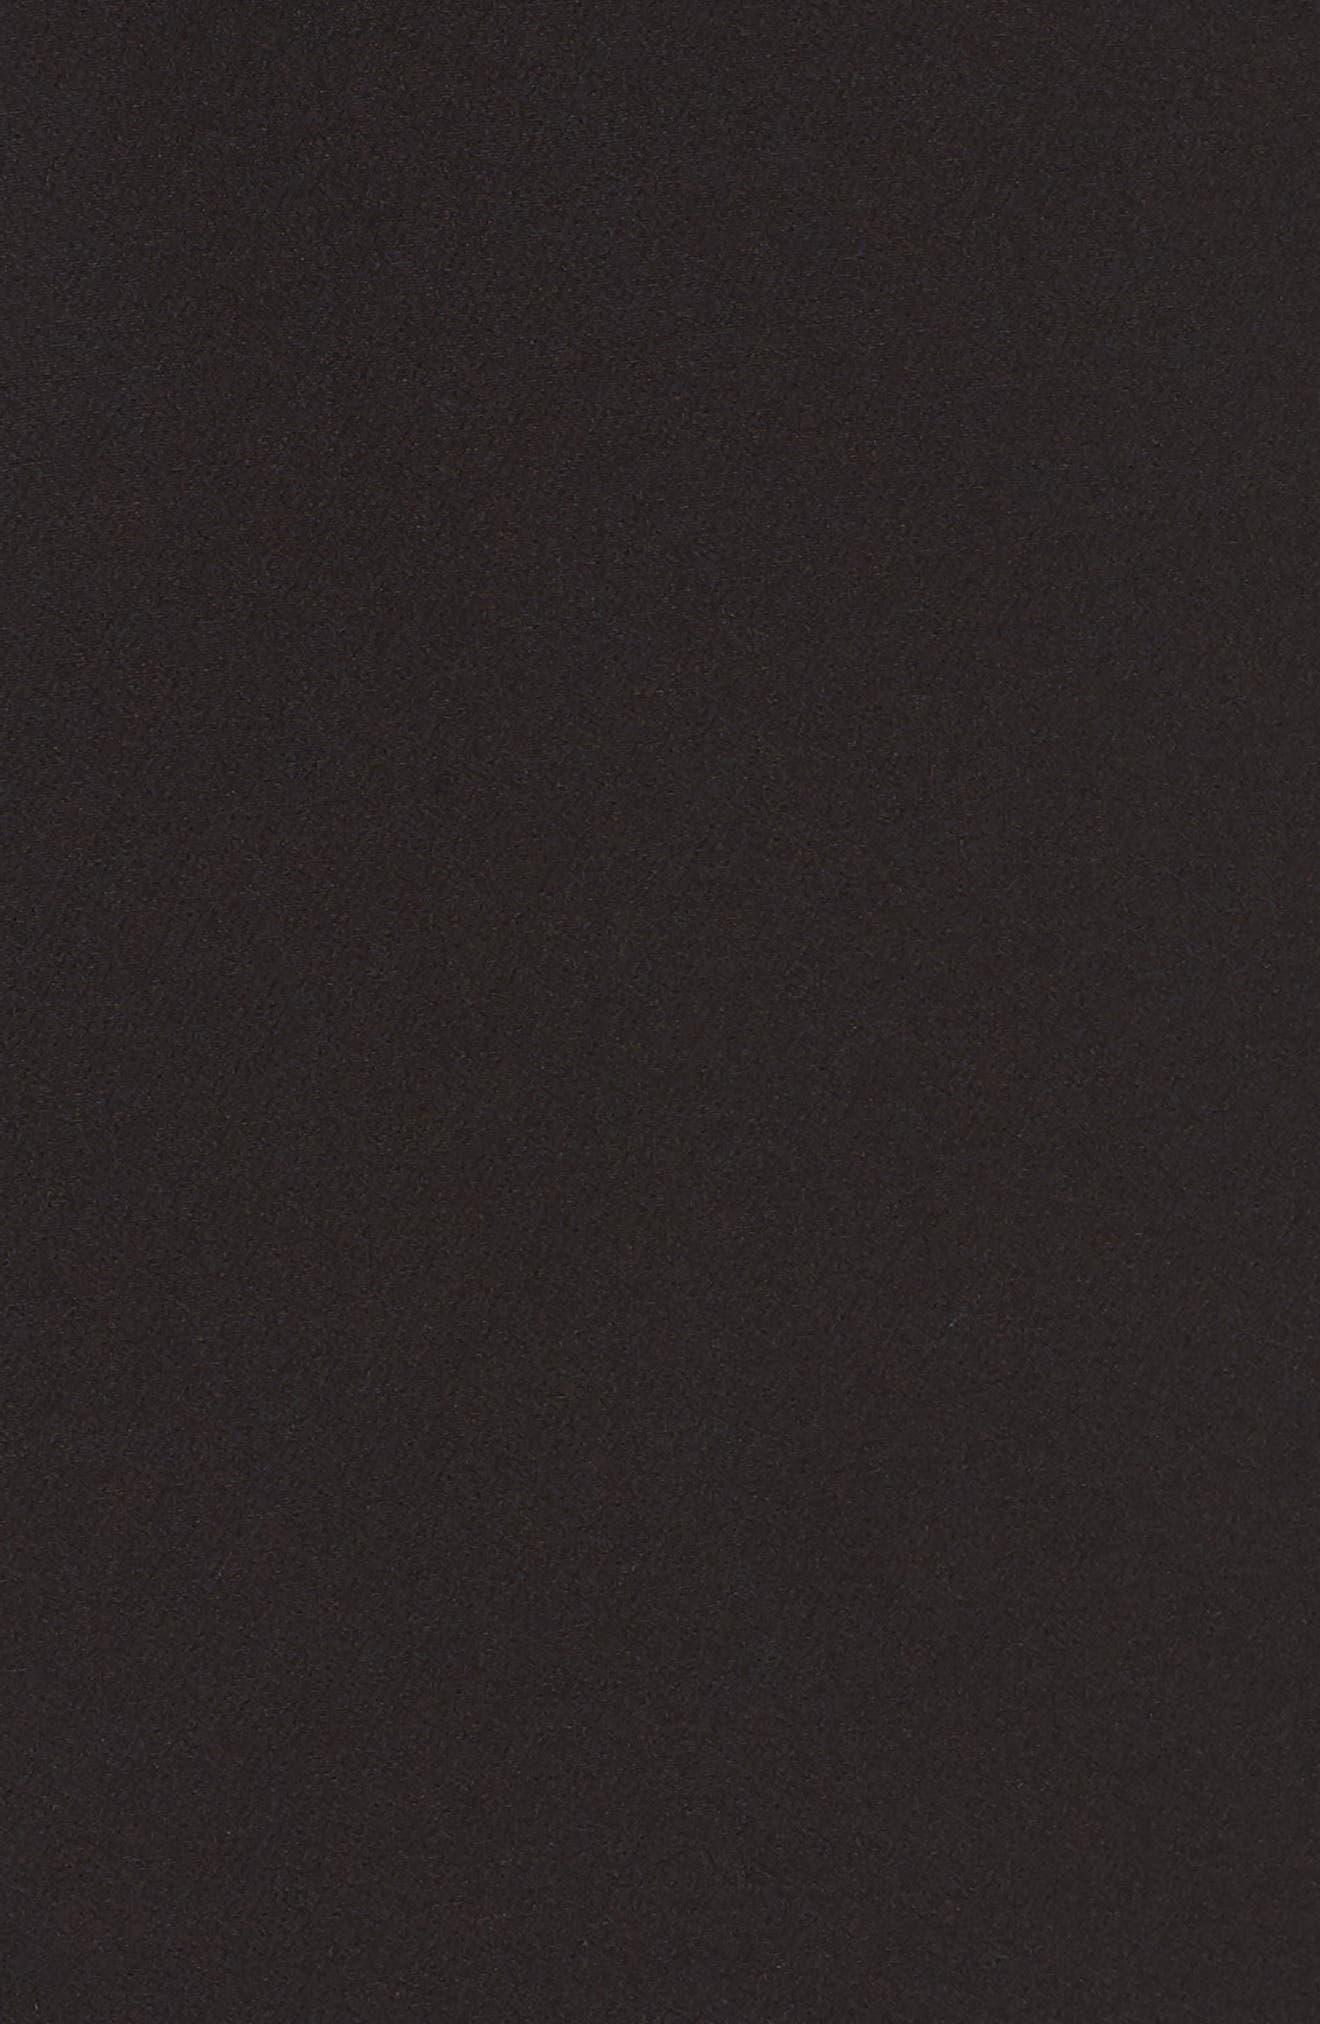 Strapless Bow Detail Sheath Dress,                             Alternate thumbnail 6, color,                             BLACK